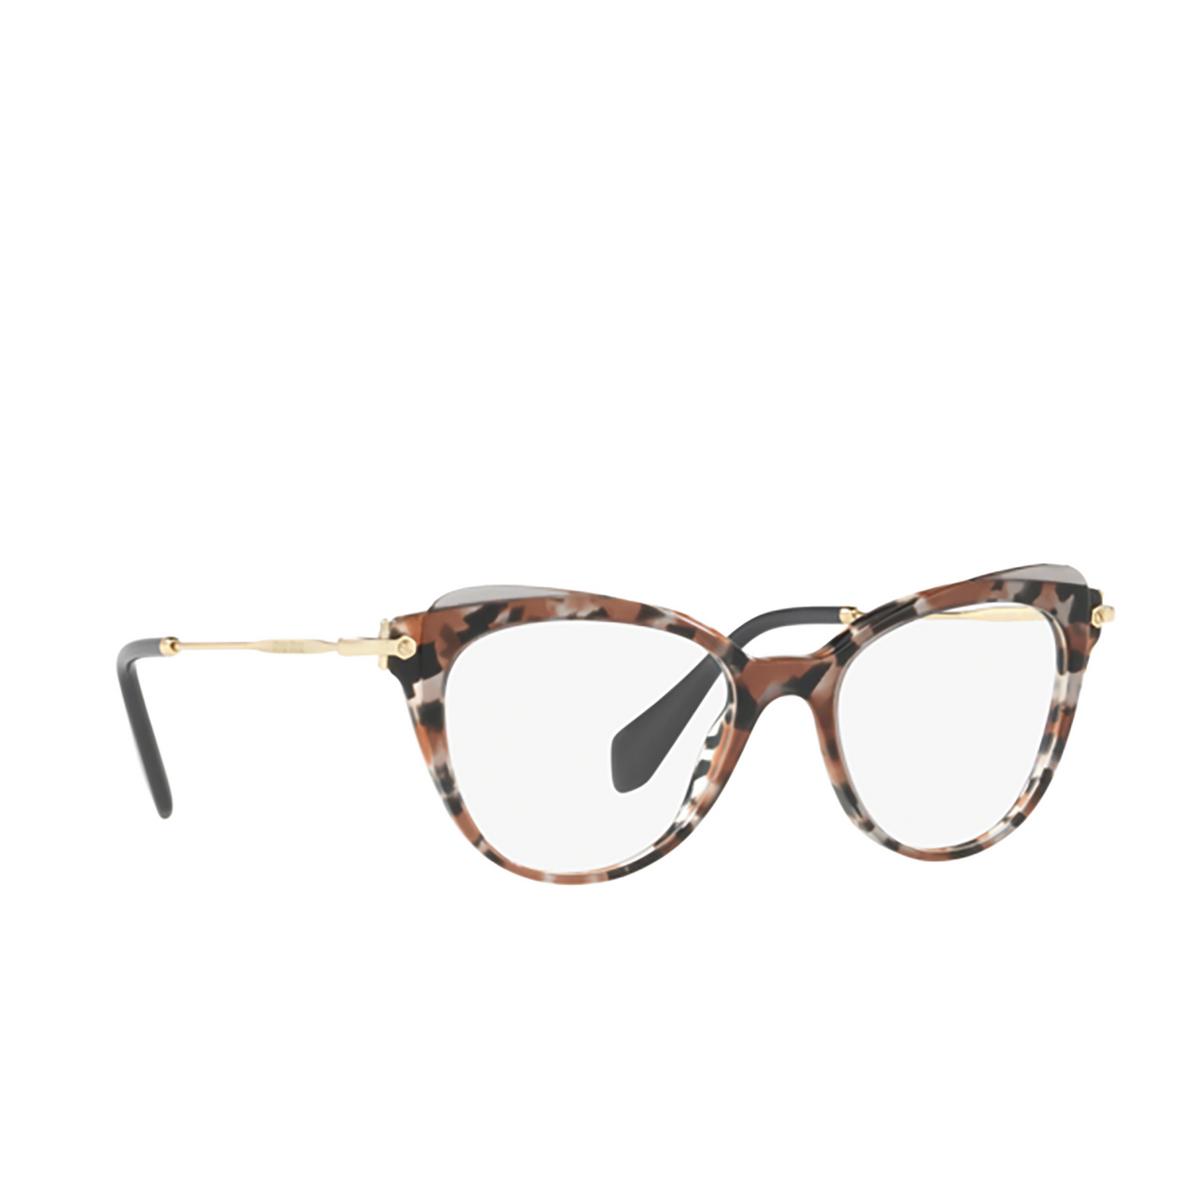 Miu Miu® Cat-eye Eyeglasses: MU 01QV color Grey Havana / Cocoa / Grey Transp 1111O1 - three-quarters view.